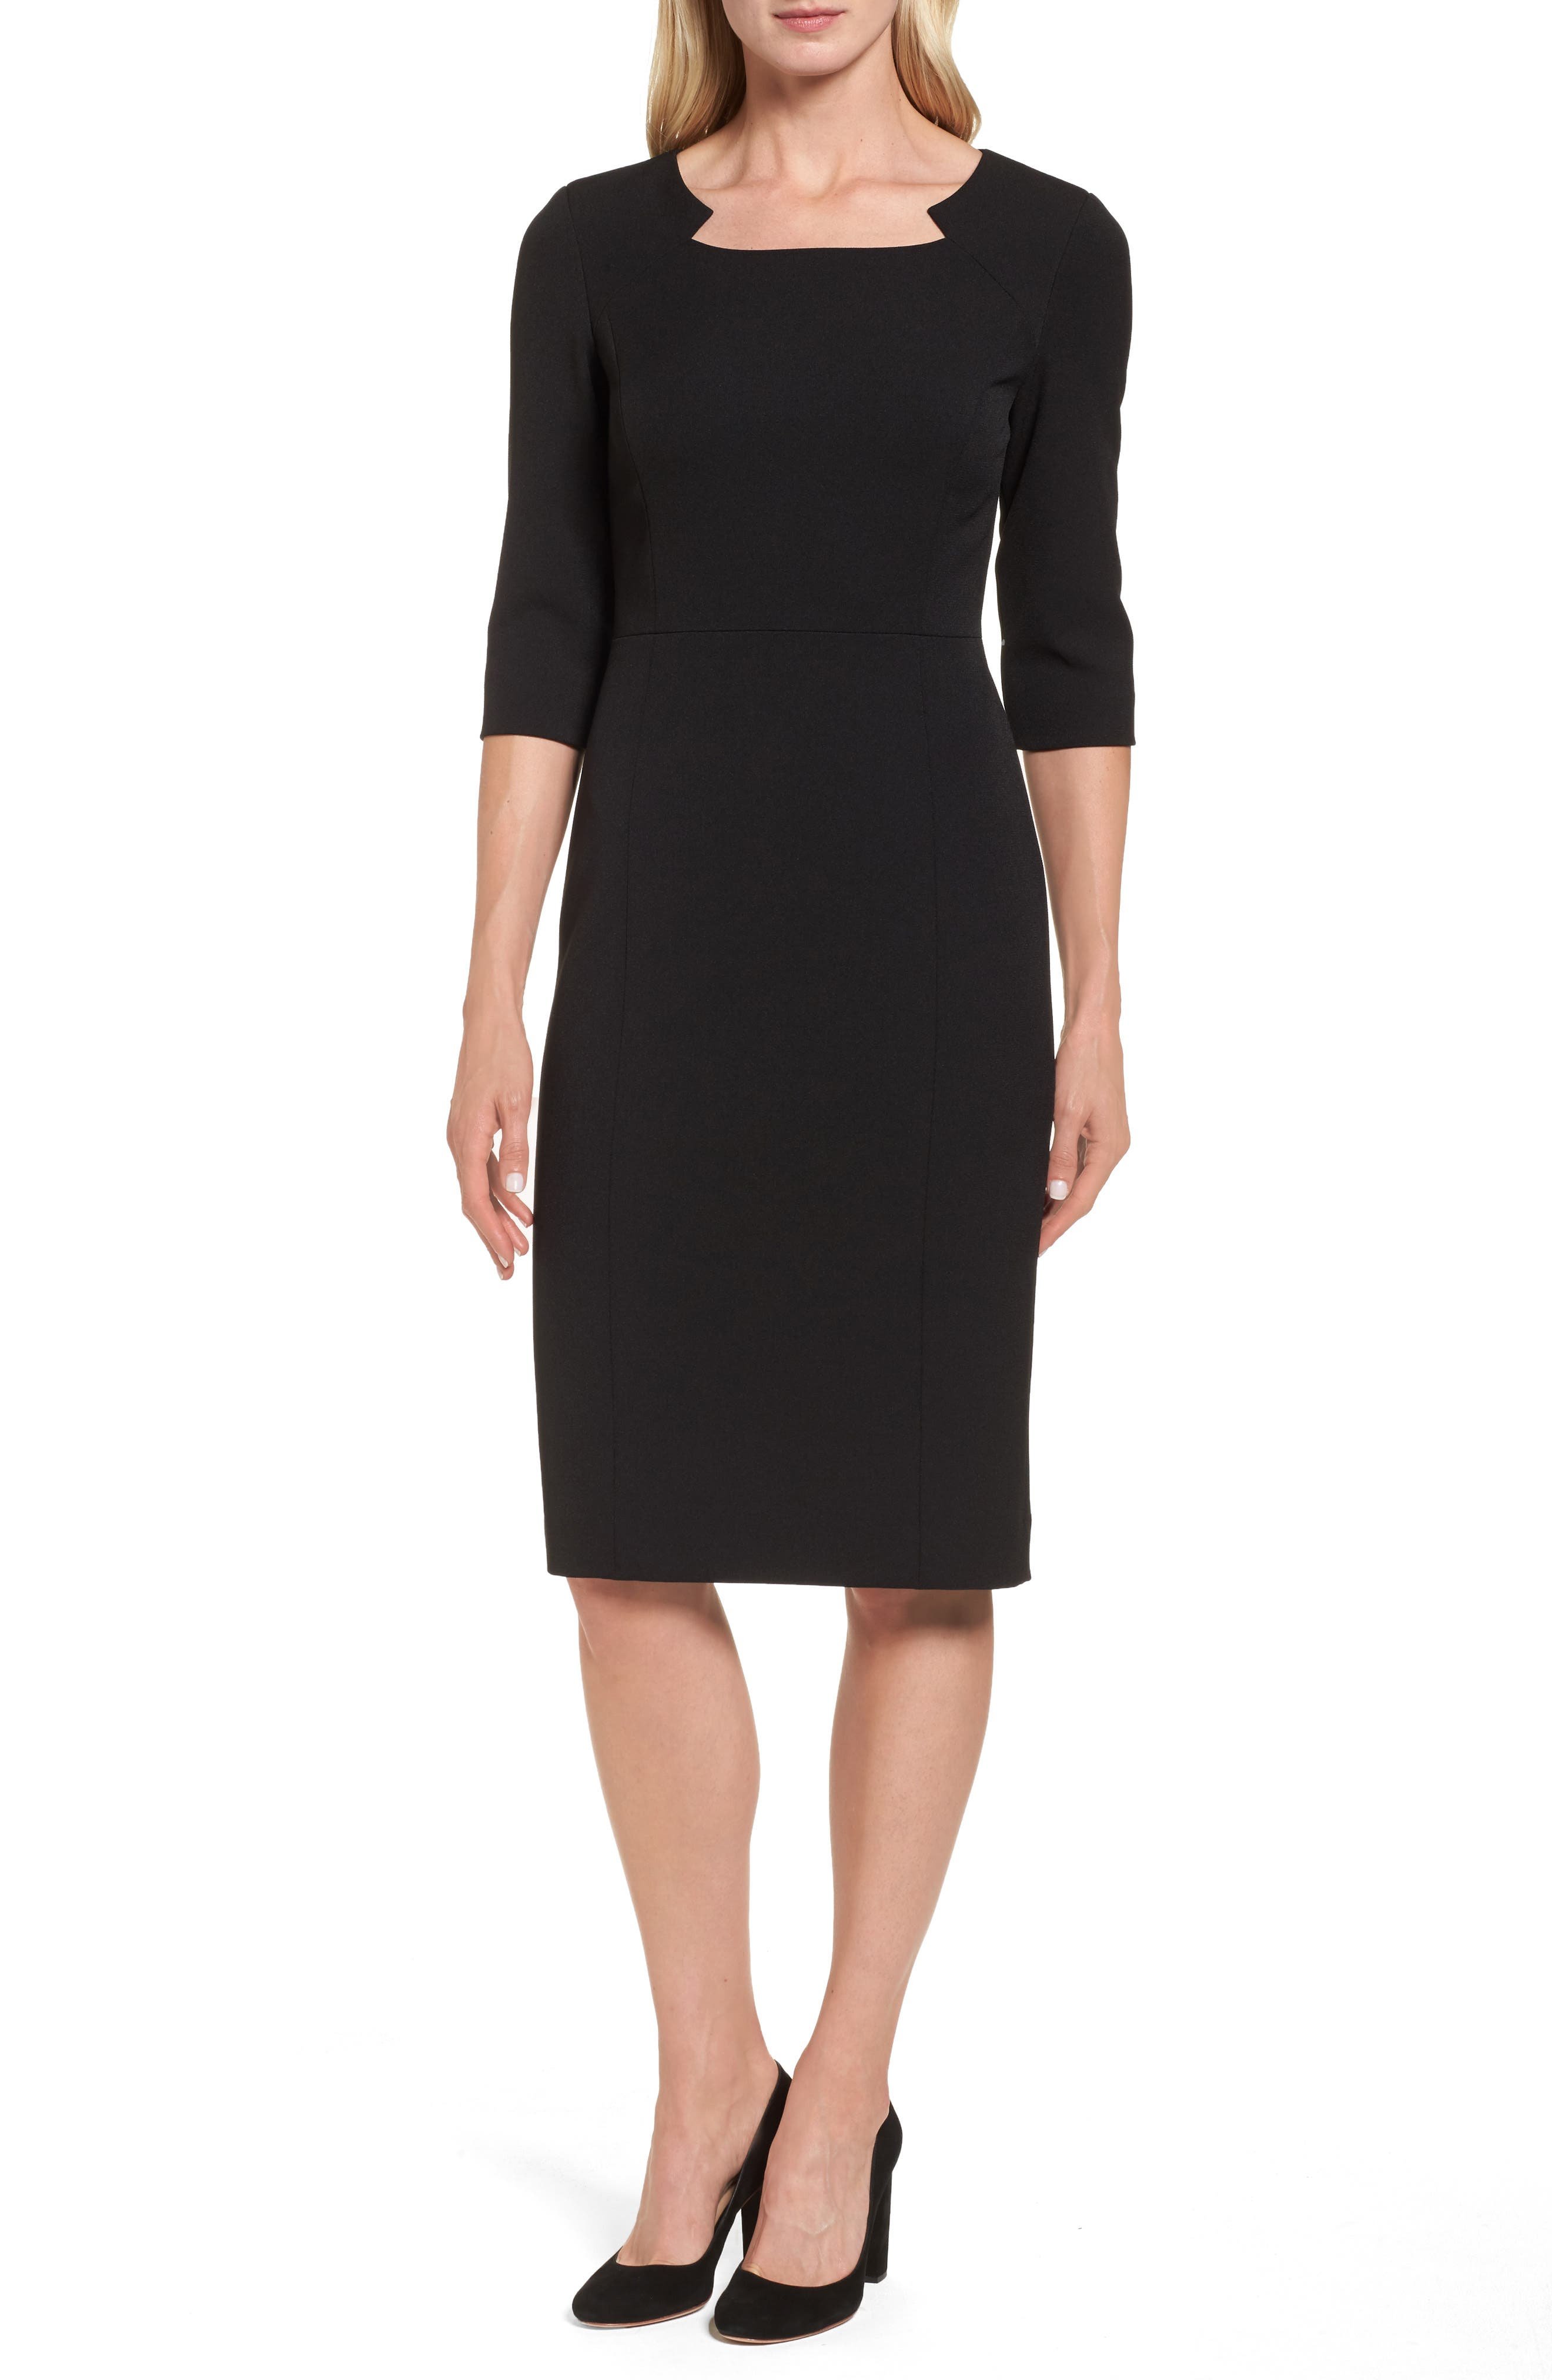 Alternate Image 1 Selected - Emerson Rose Stretch Sheath Dress